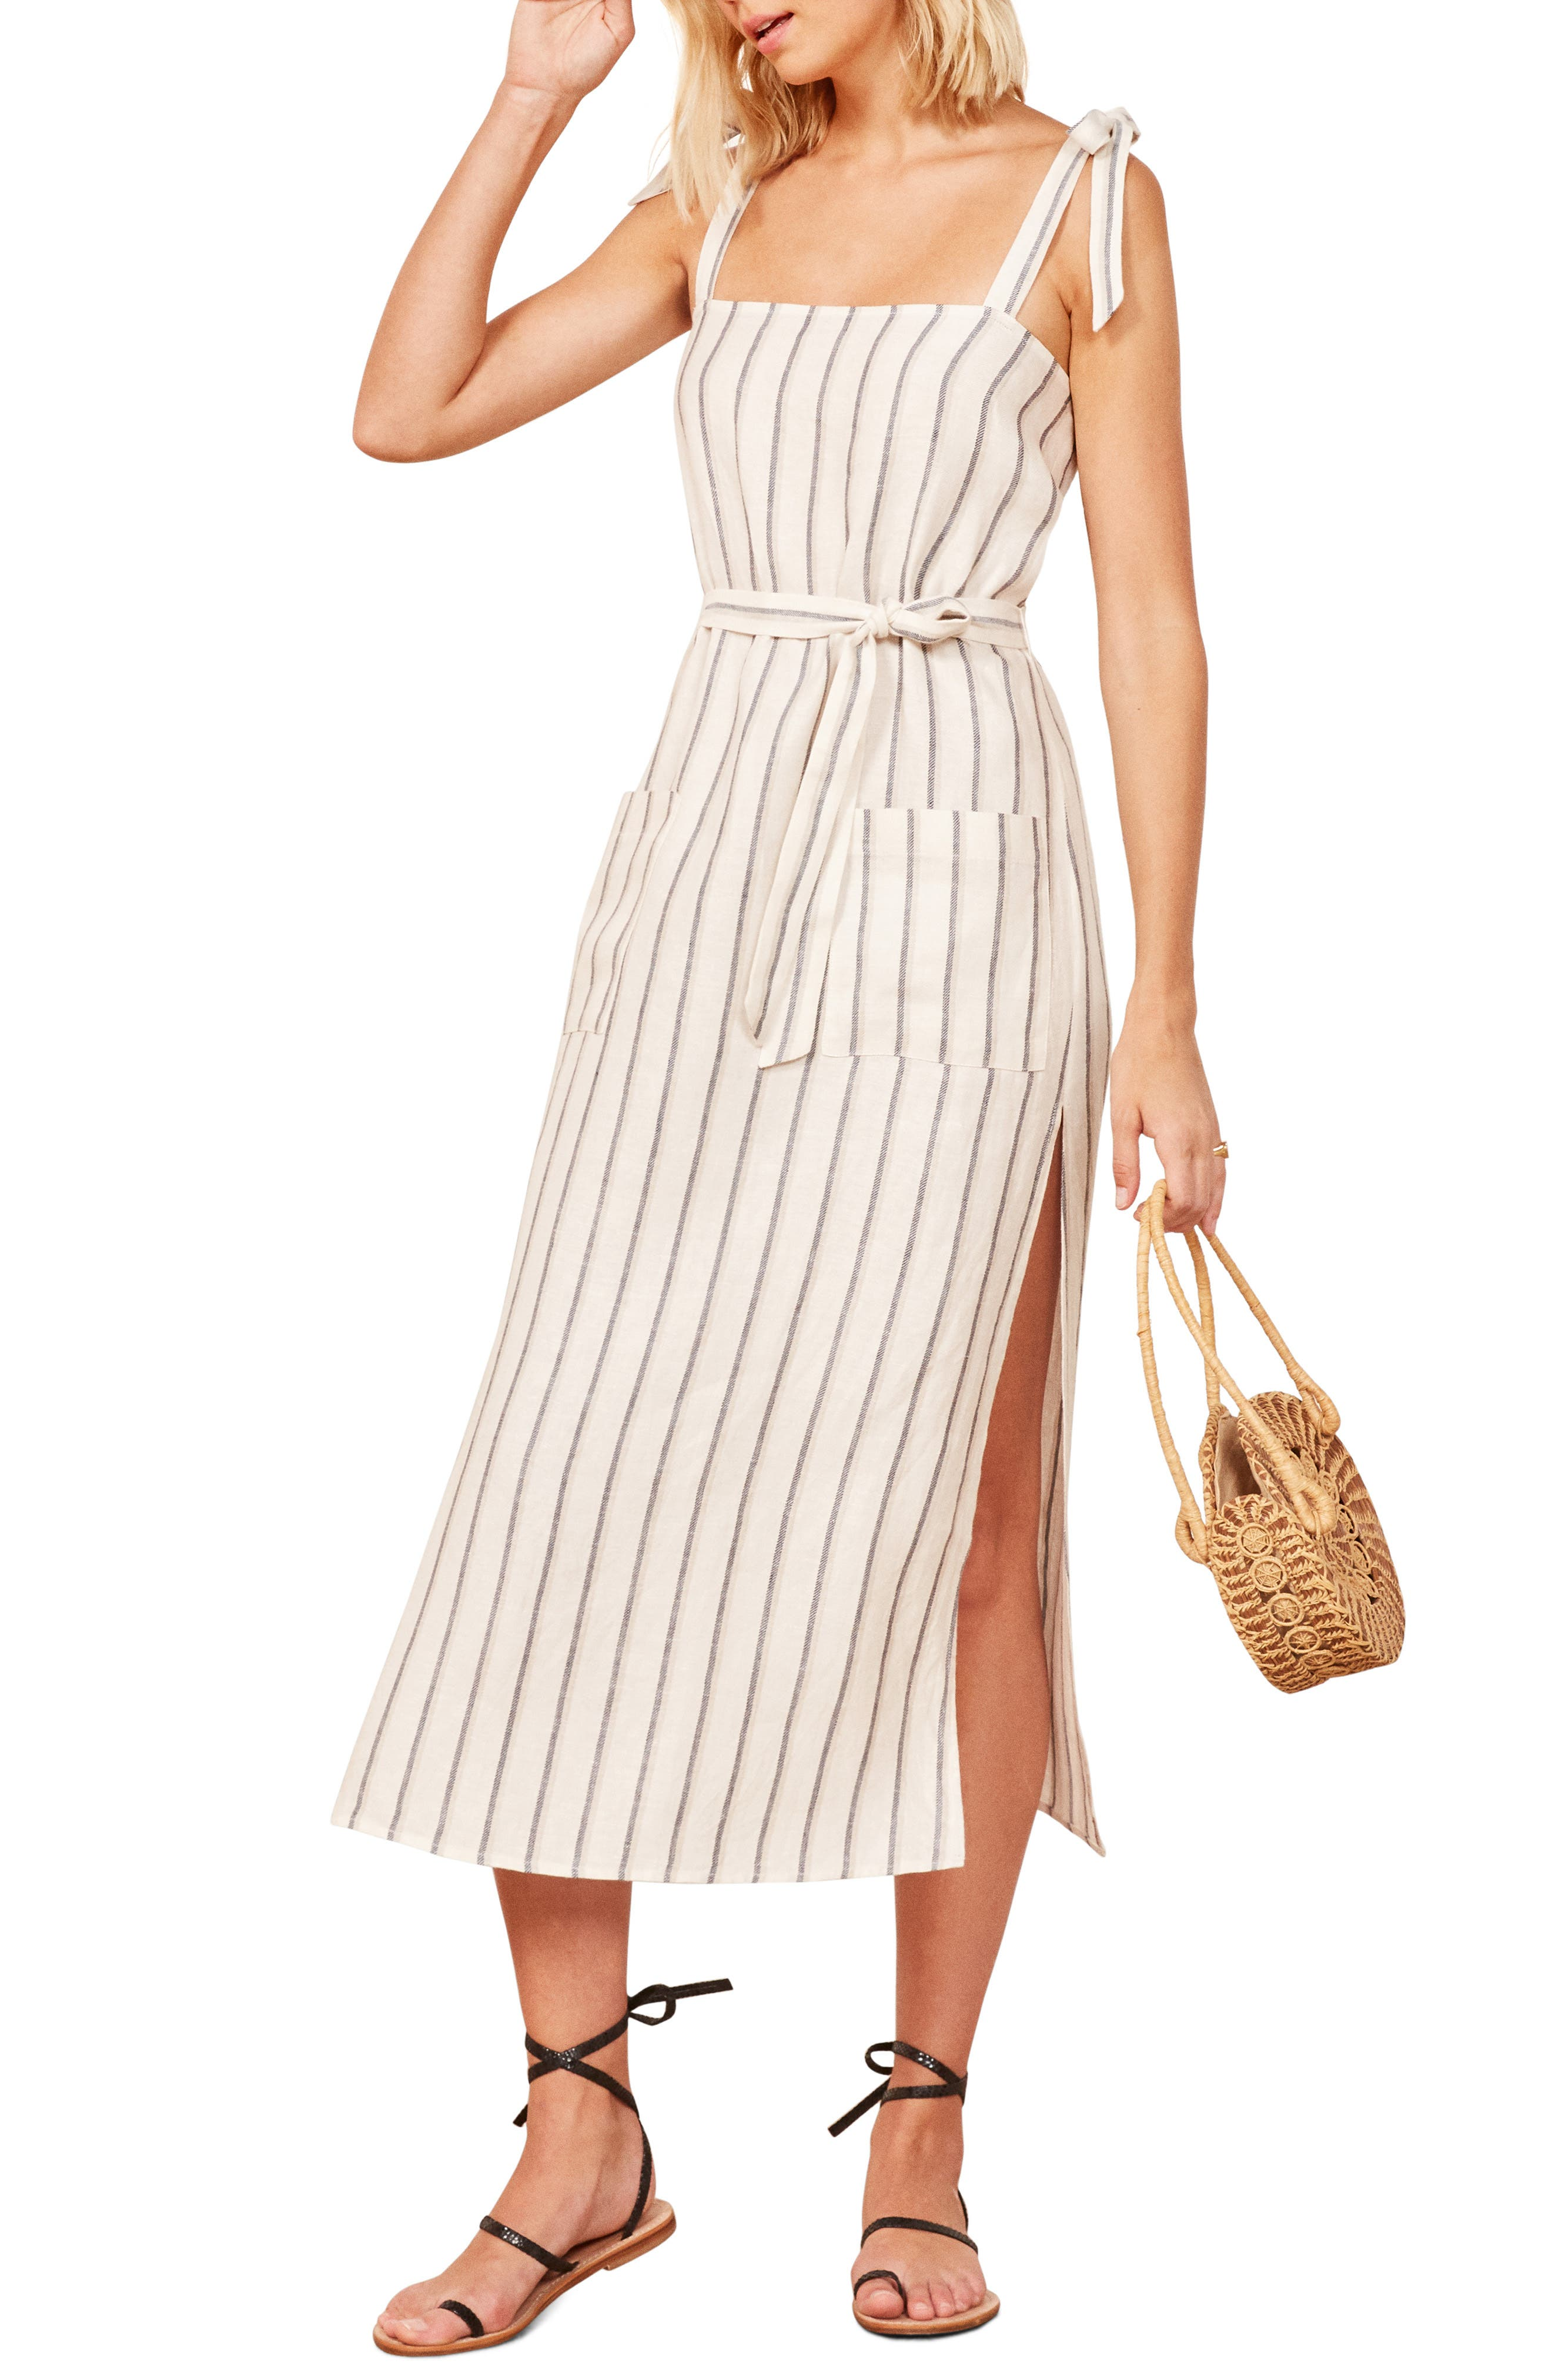 REFORMATION Elliot Midi Dress, Main, color, 100